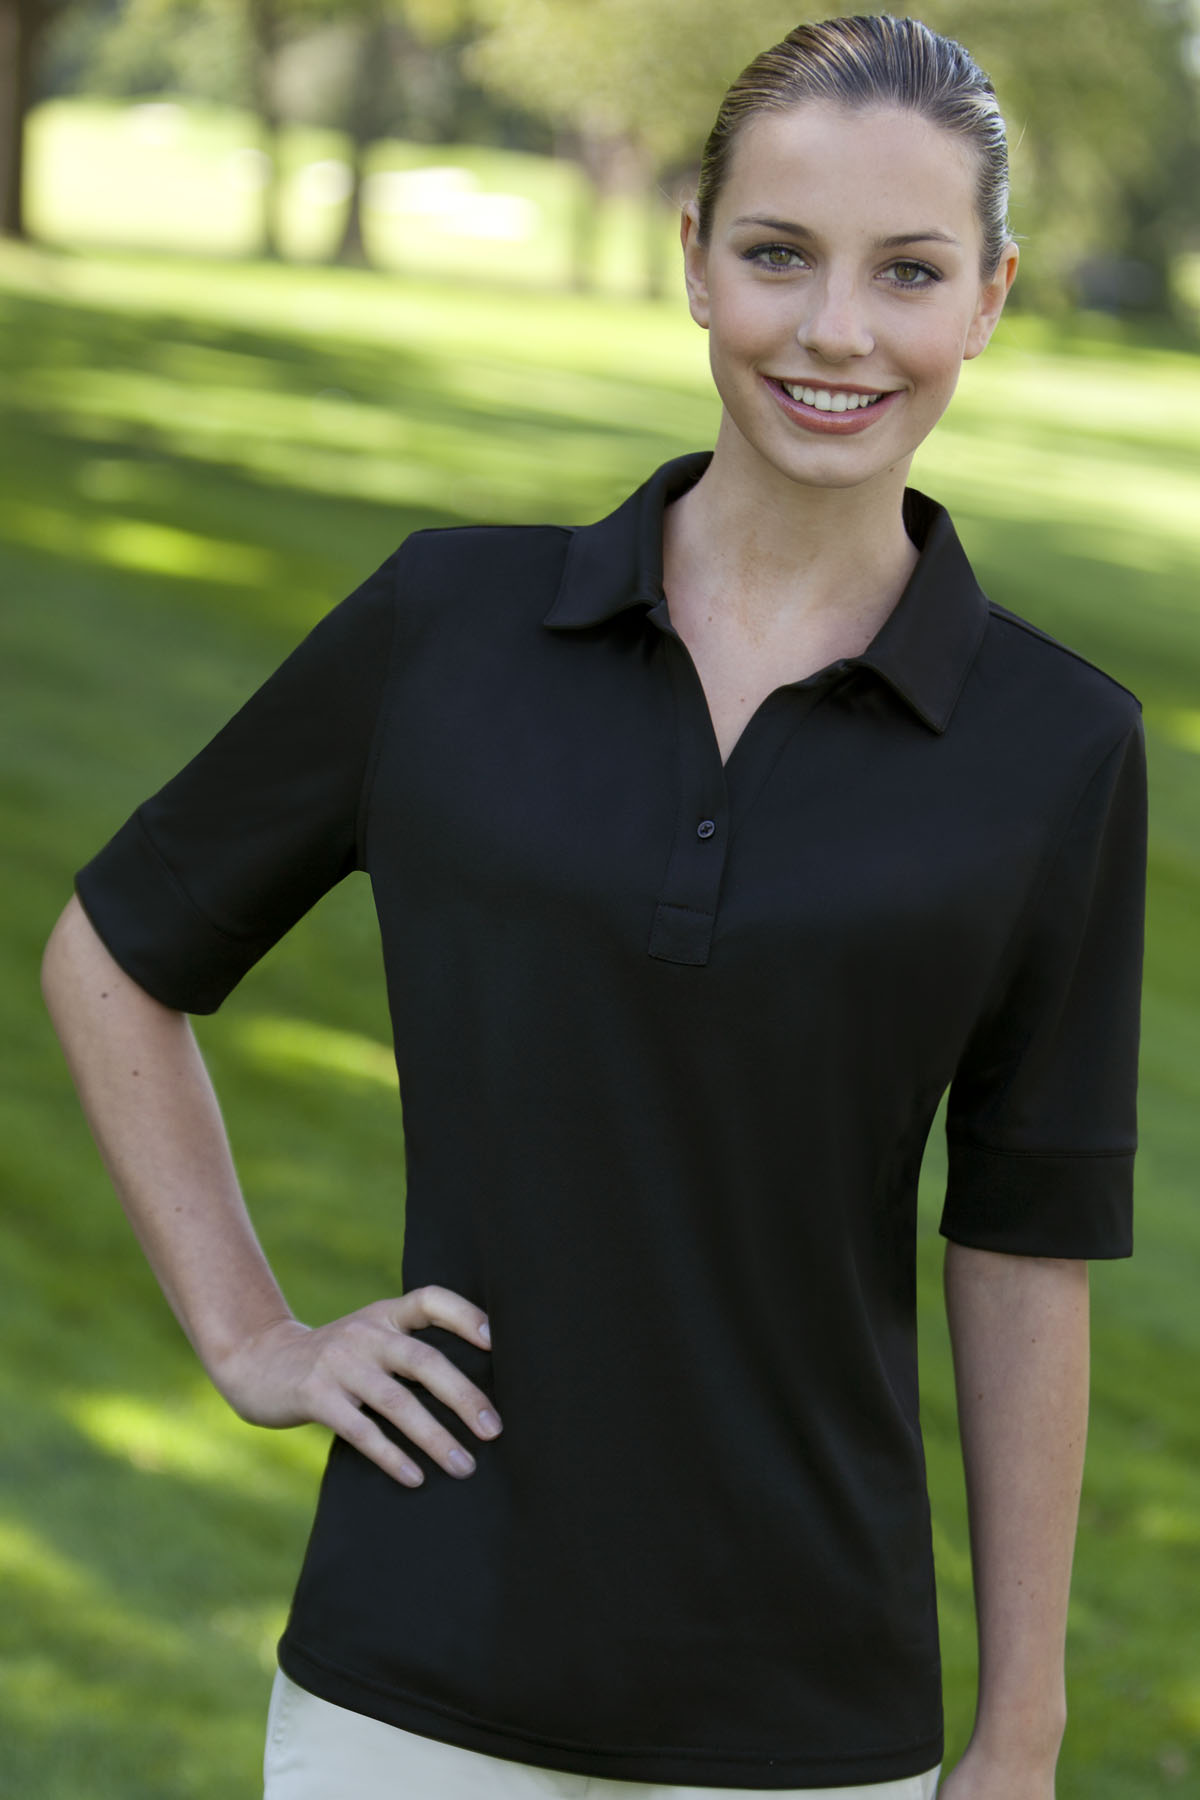 Izod IZOD0117 - Women's Solid Jersey Polo